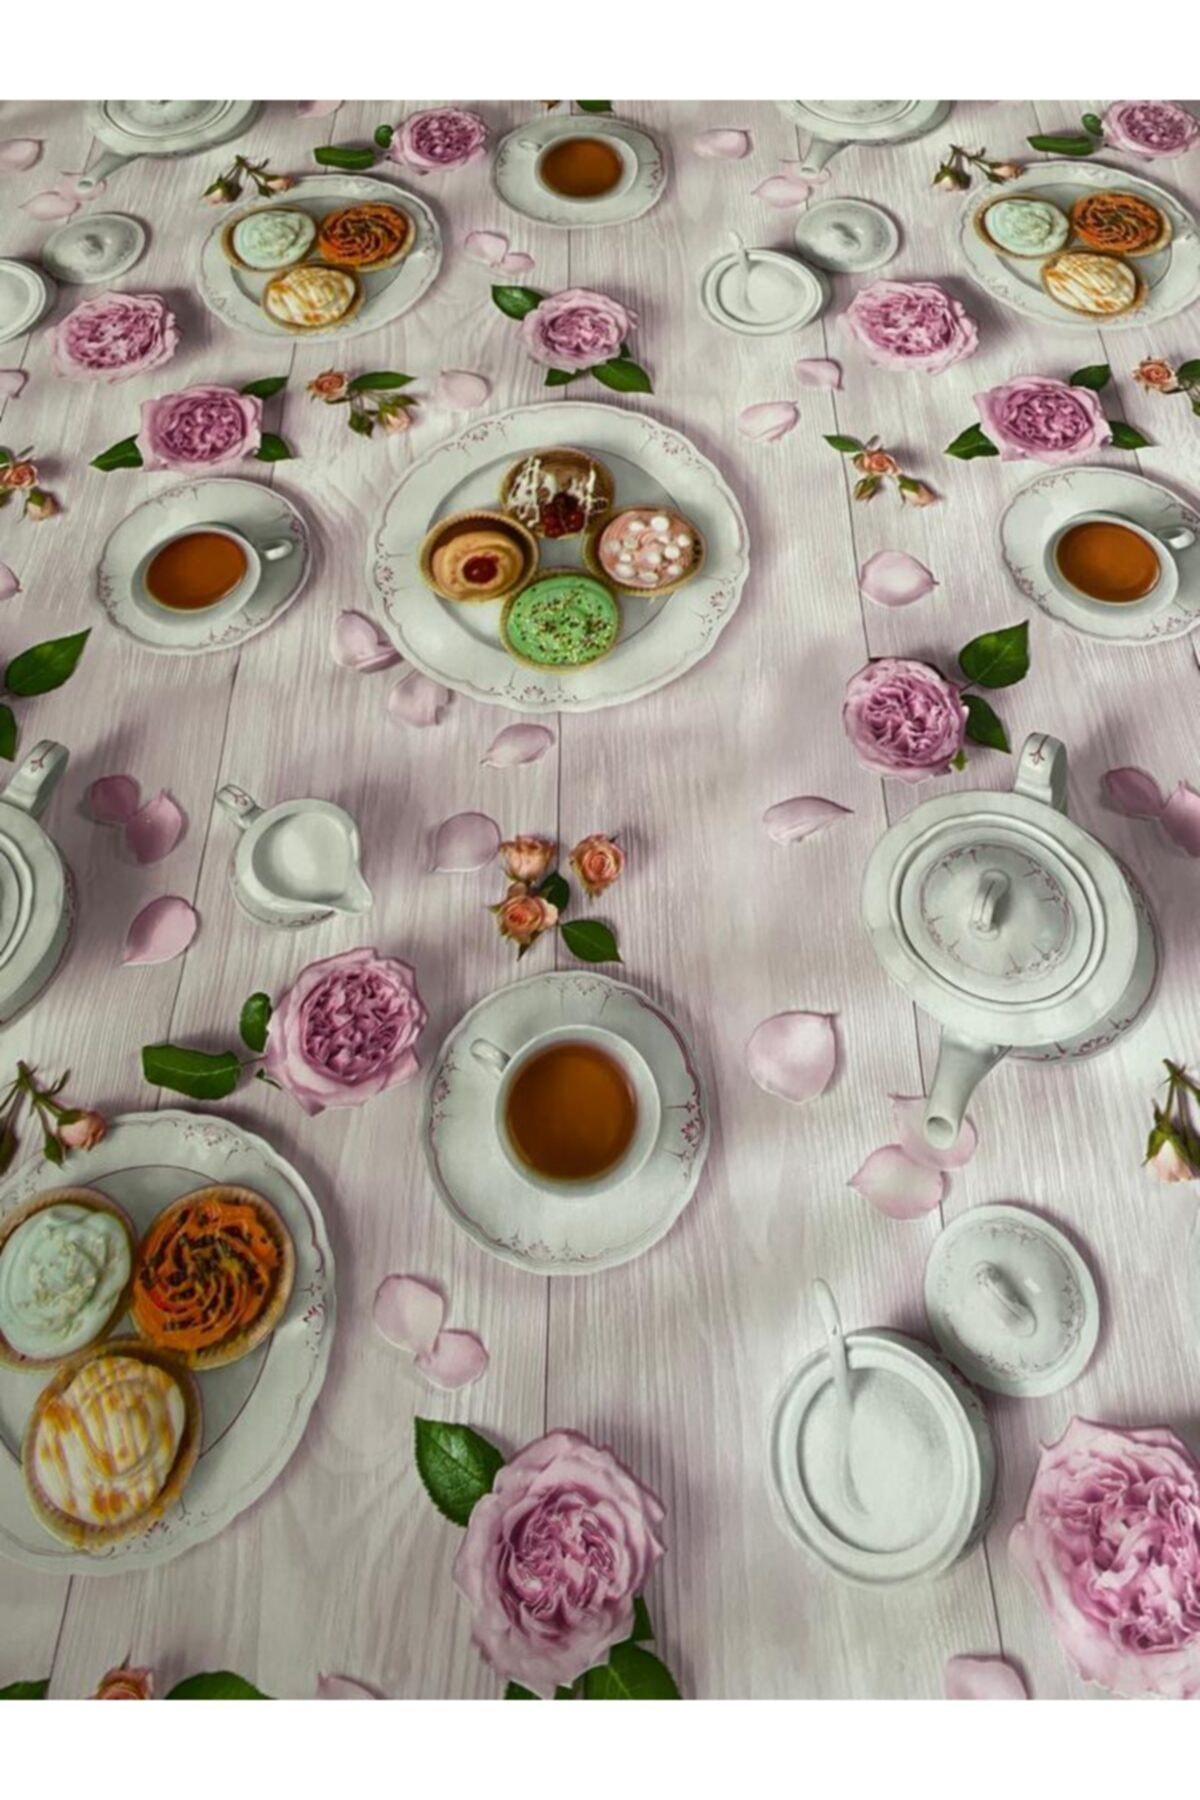 Fiesta Ithal Pvc Masa Örtüsü Muşamba Silinebilir,leke Tutmaz,kaymaz 2